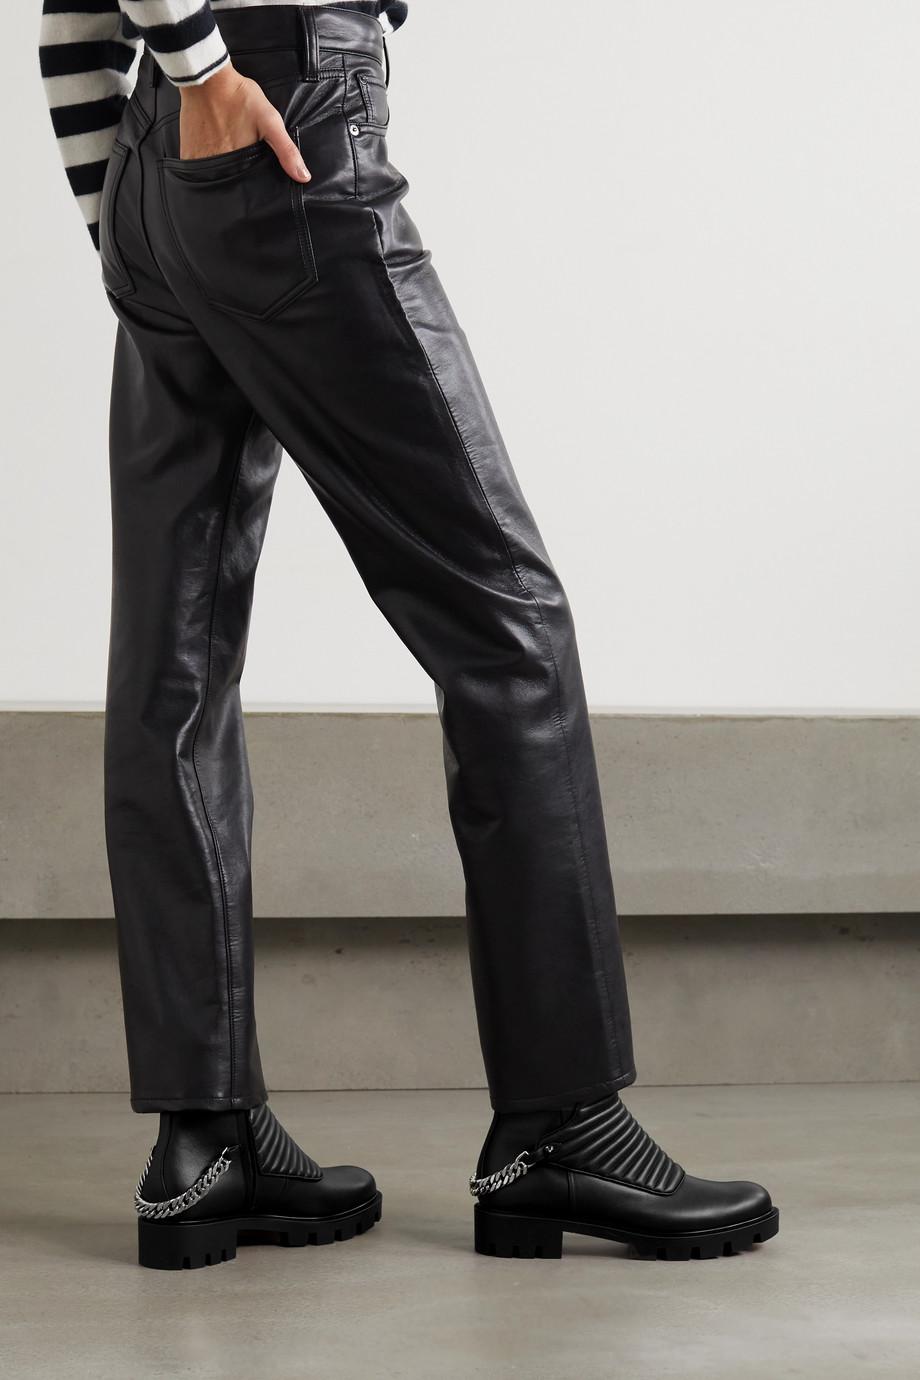 Christian Louboutin Bottines en cuir à chaînes Maddic Max